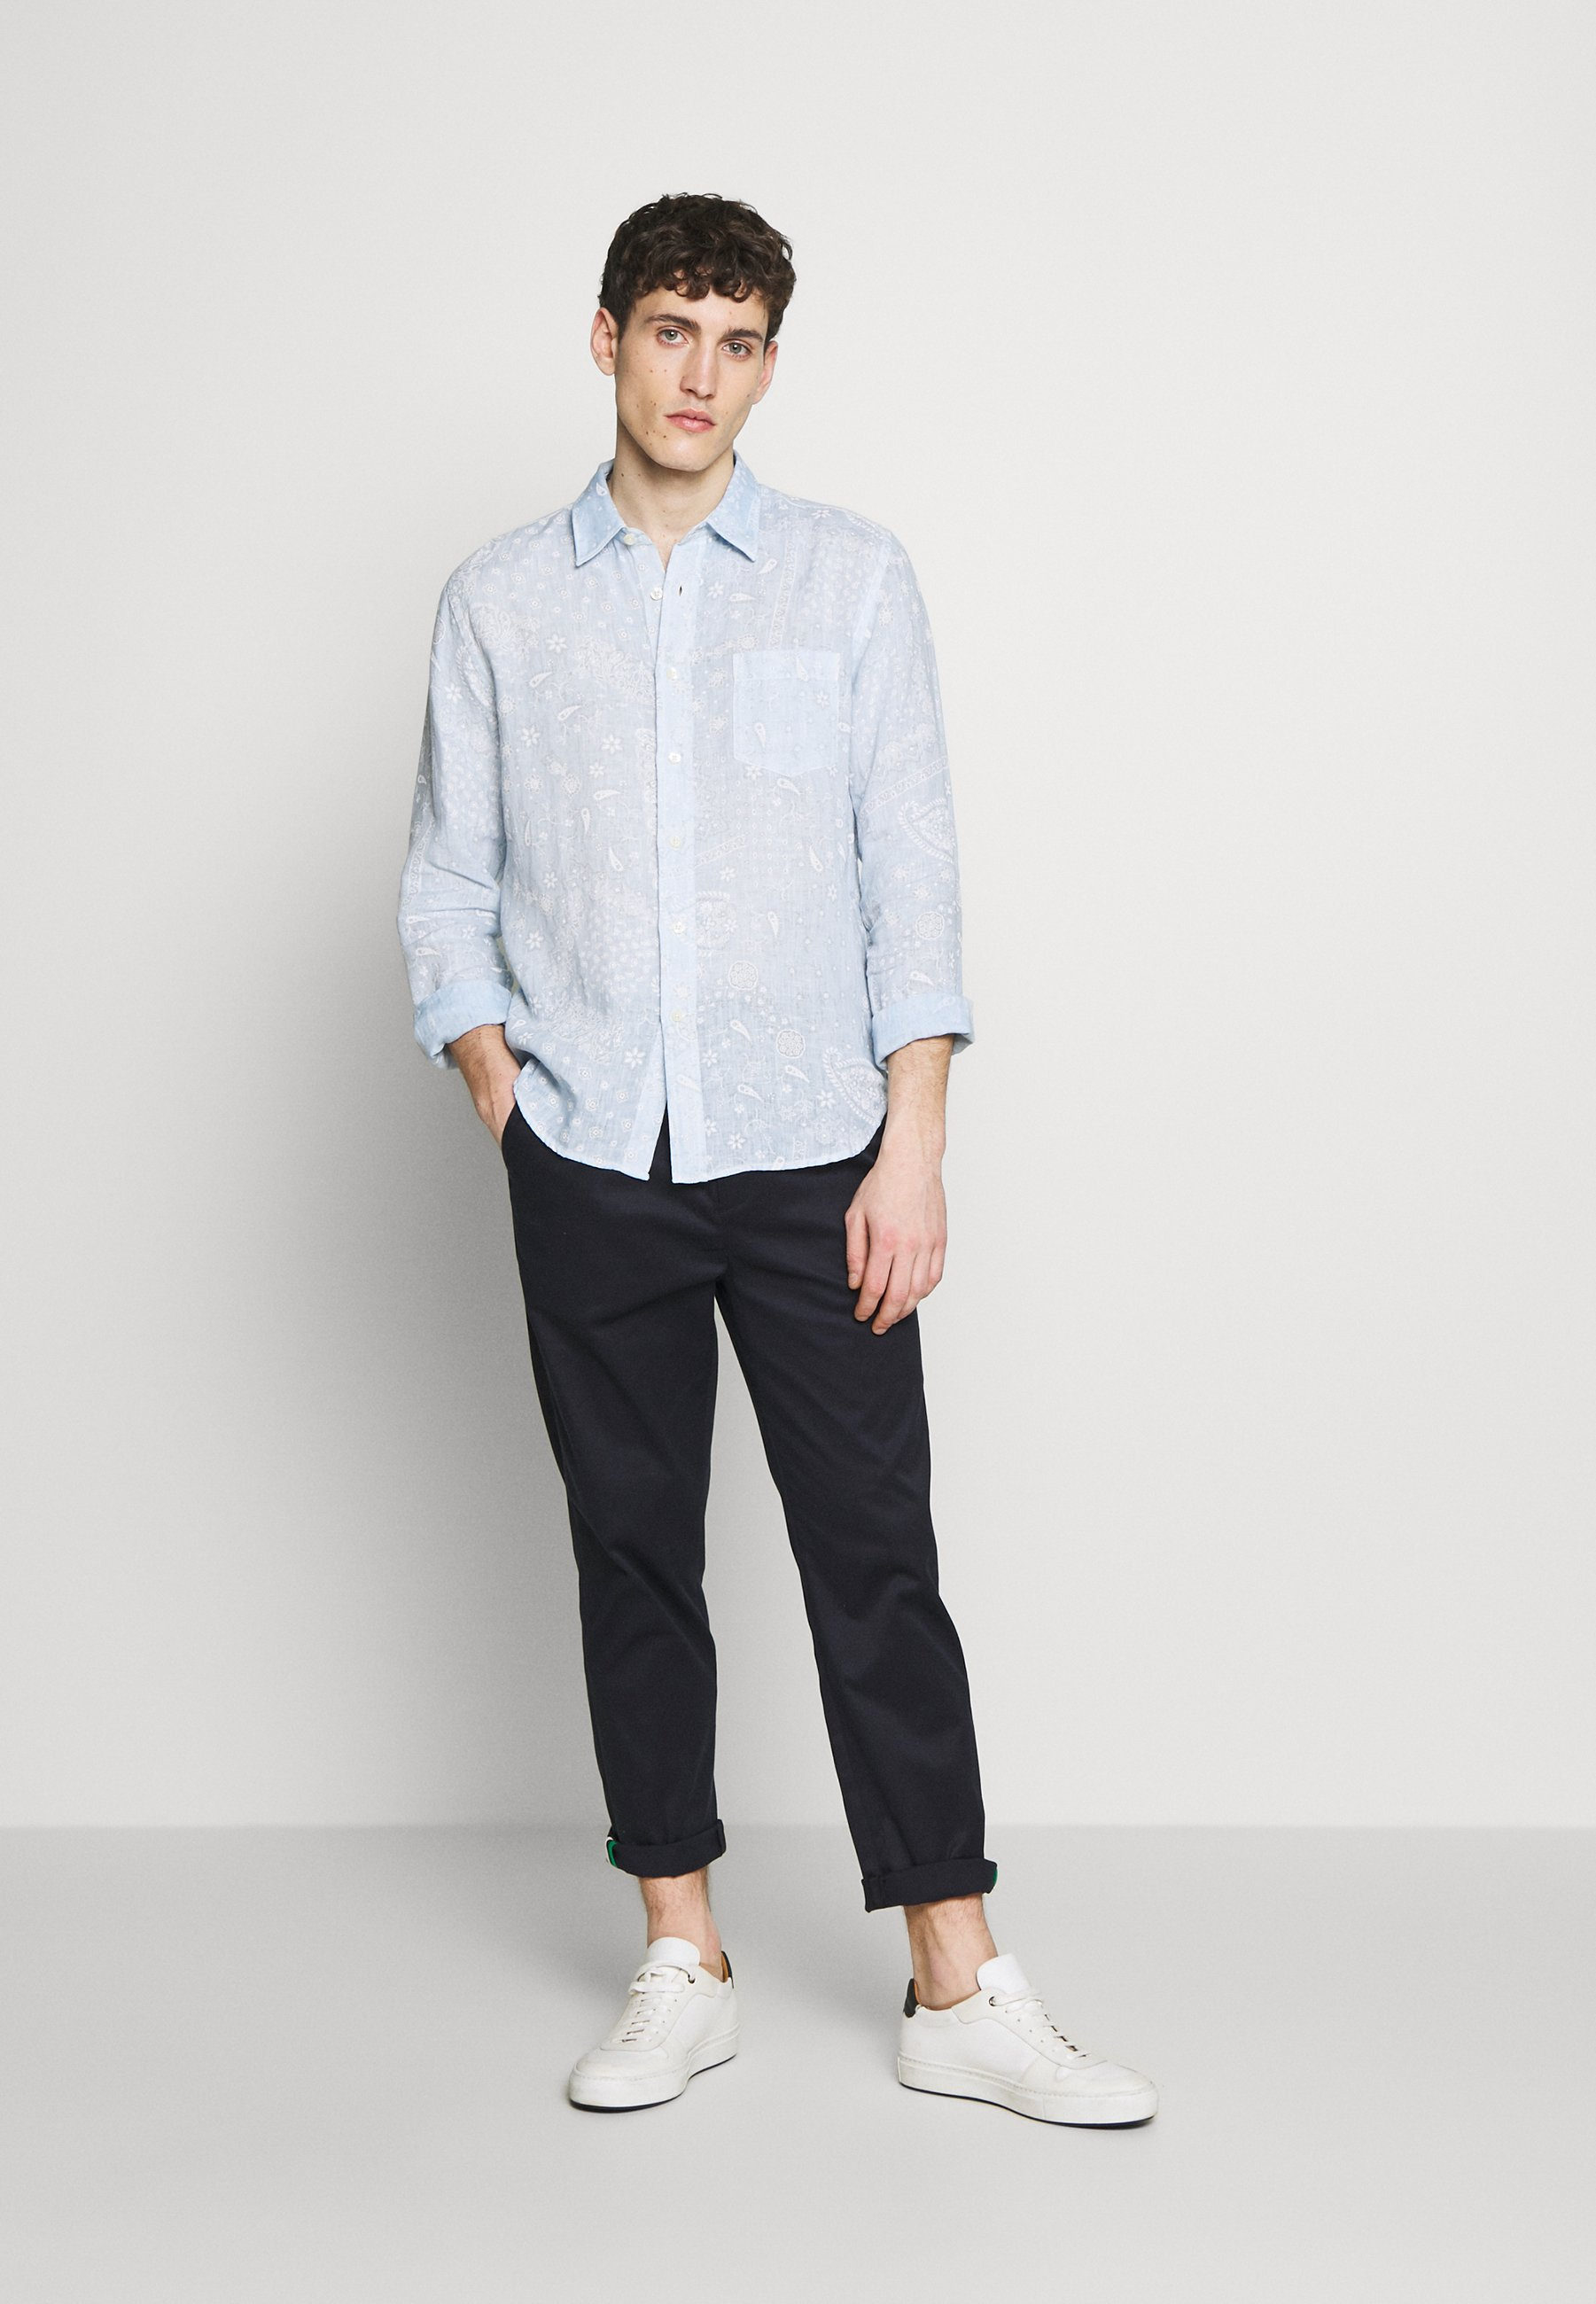 120% Lino Print Paisley - Skjorter Pacific Blue Soft Fade